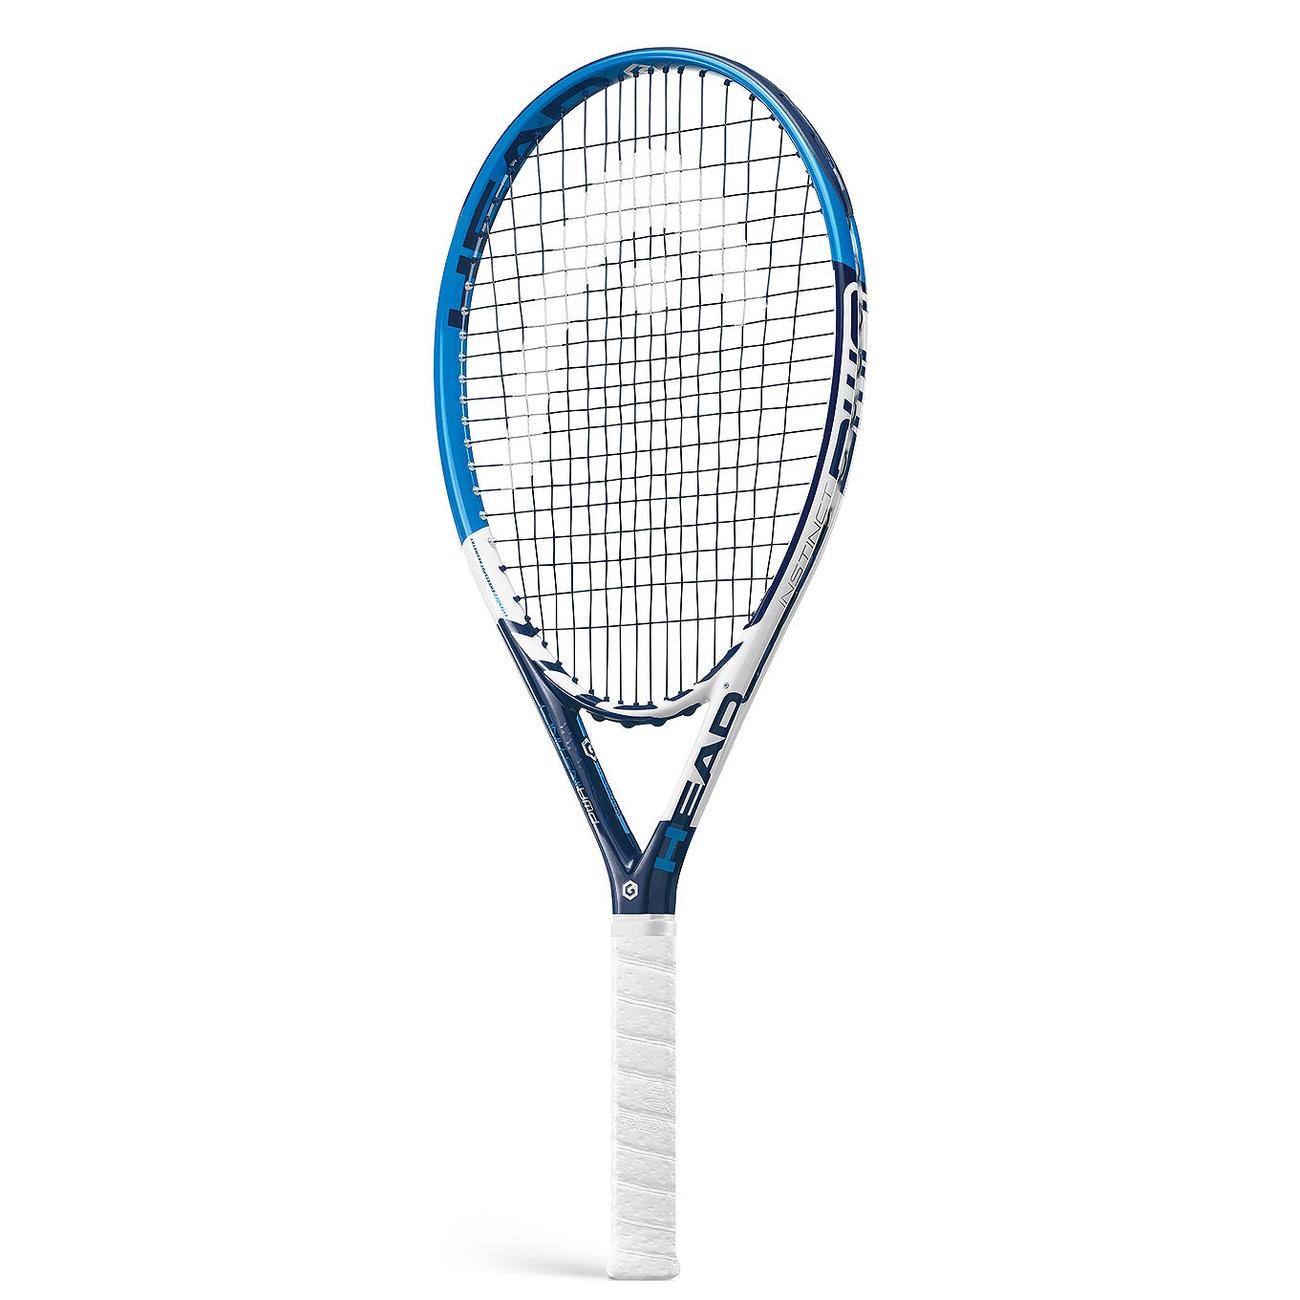 Rakieta tenisowa Head Graphene PWR Instinct